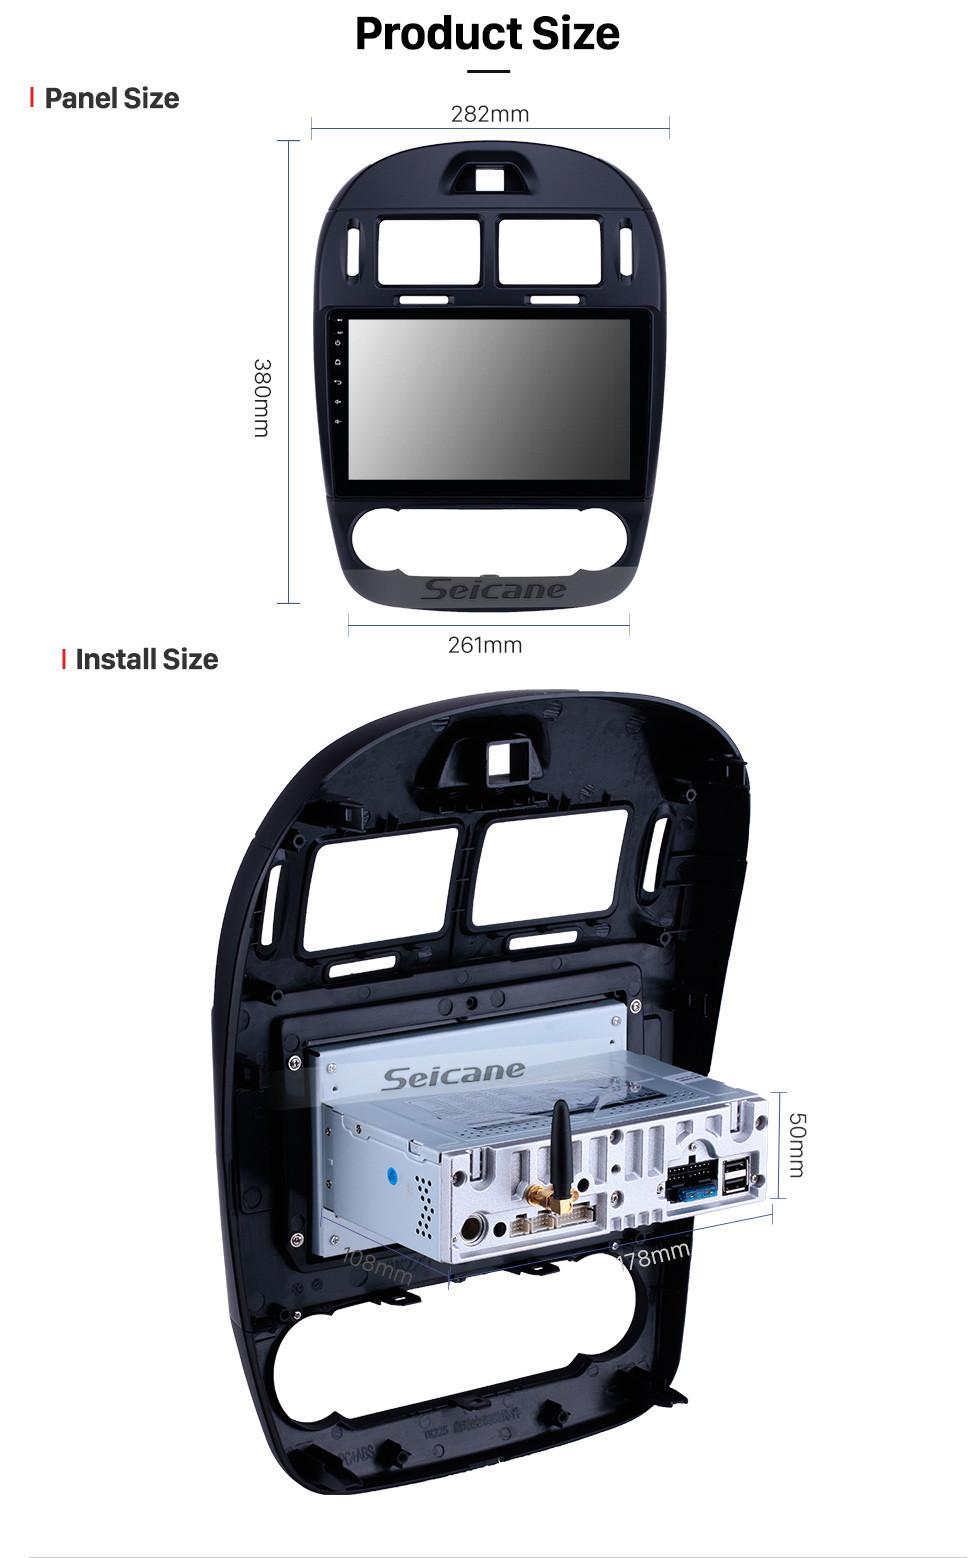 Seicane 10,1 zoll Android 9.0 Radio für 2017-2019 Kia Cerato Auto A / C Bluetooth Wifi HD Touchscreen GPS Navigation Carplay USB unterstützung DVR OBD2 Rückfahrkamera